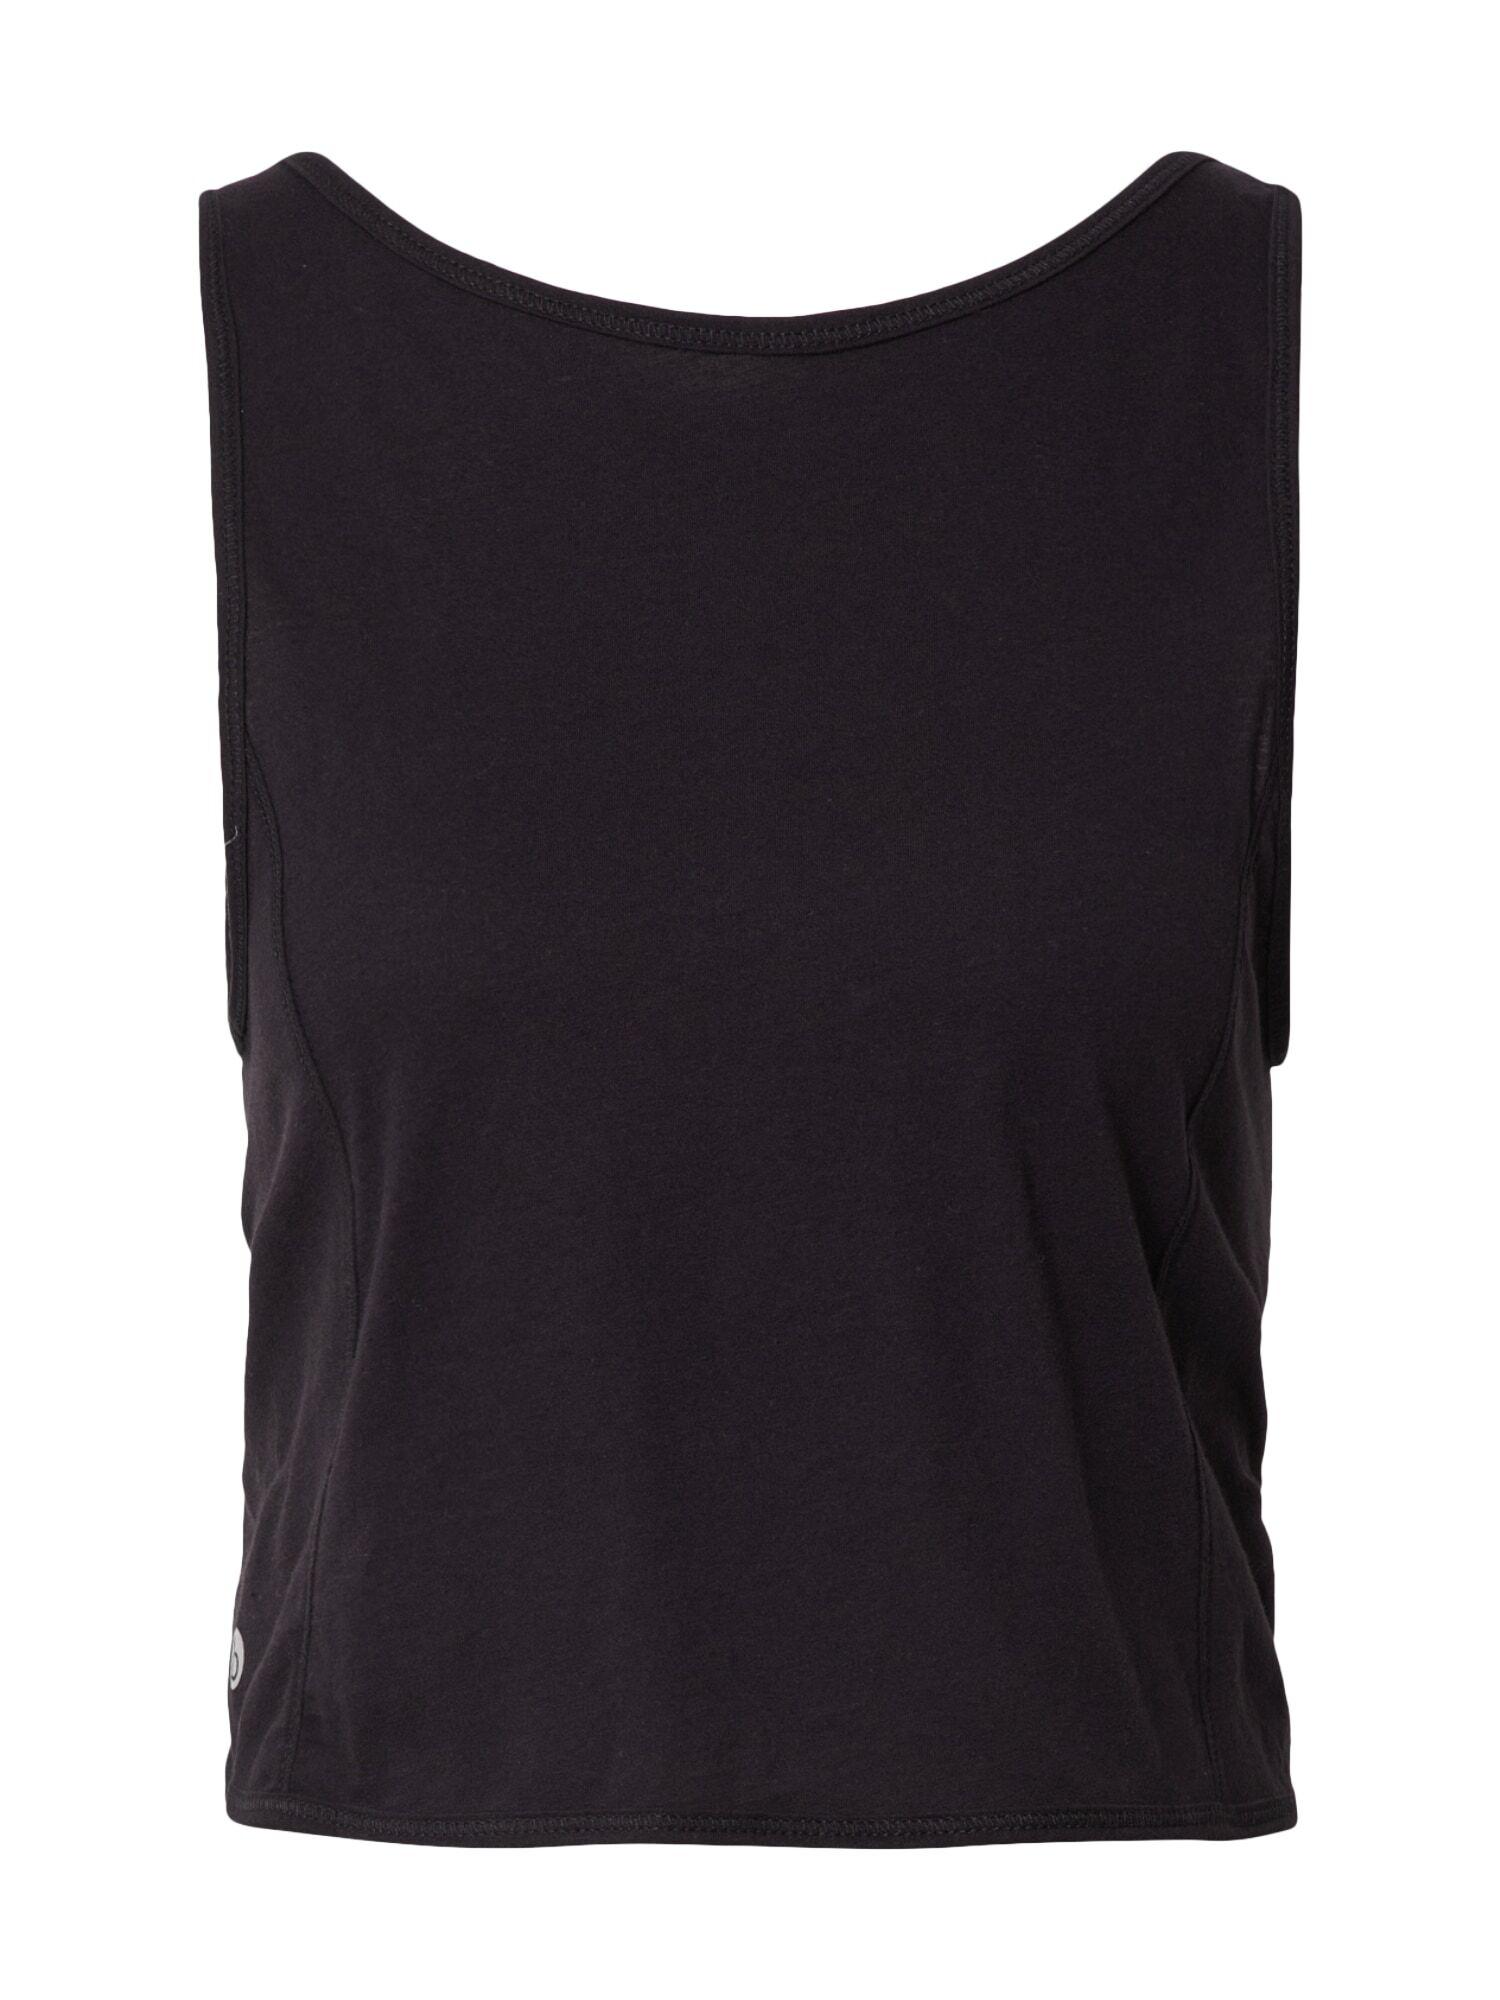 Cotton On Haut 'ON THE GO'  - Noir - Taille: XL - female